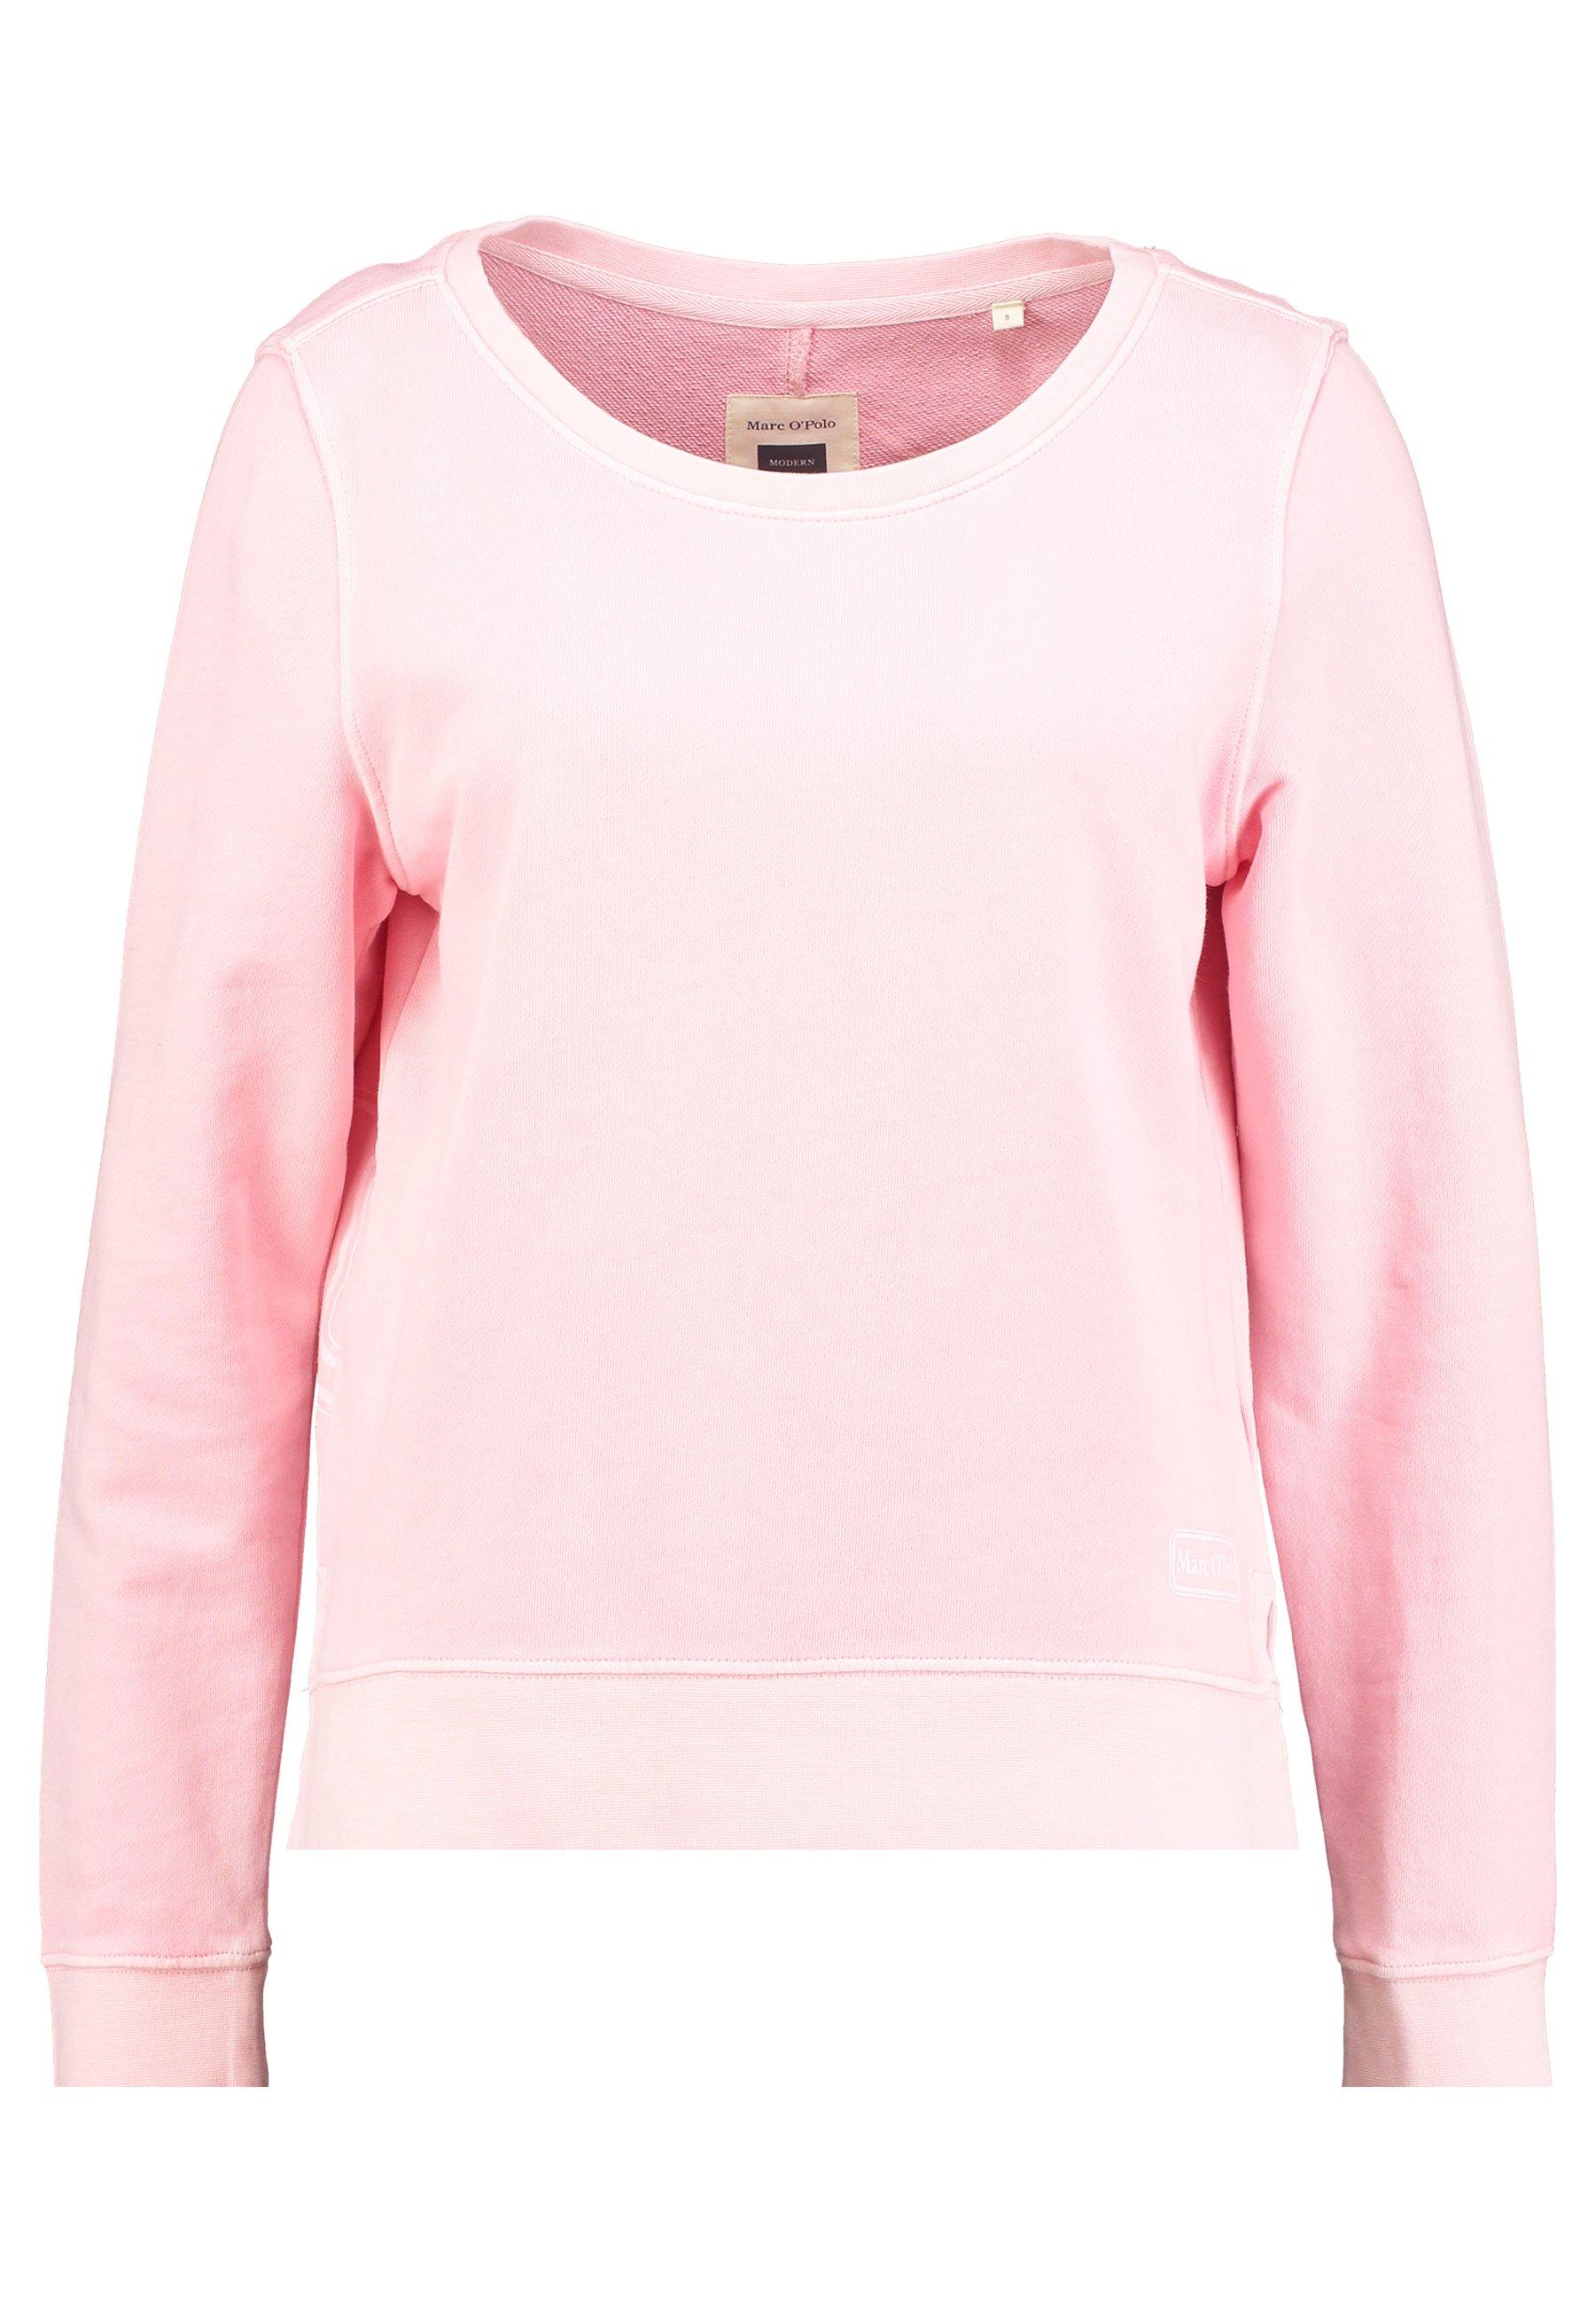 Marc O'polo Dye Mop Print - Sweatshirt Strawberry Cream